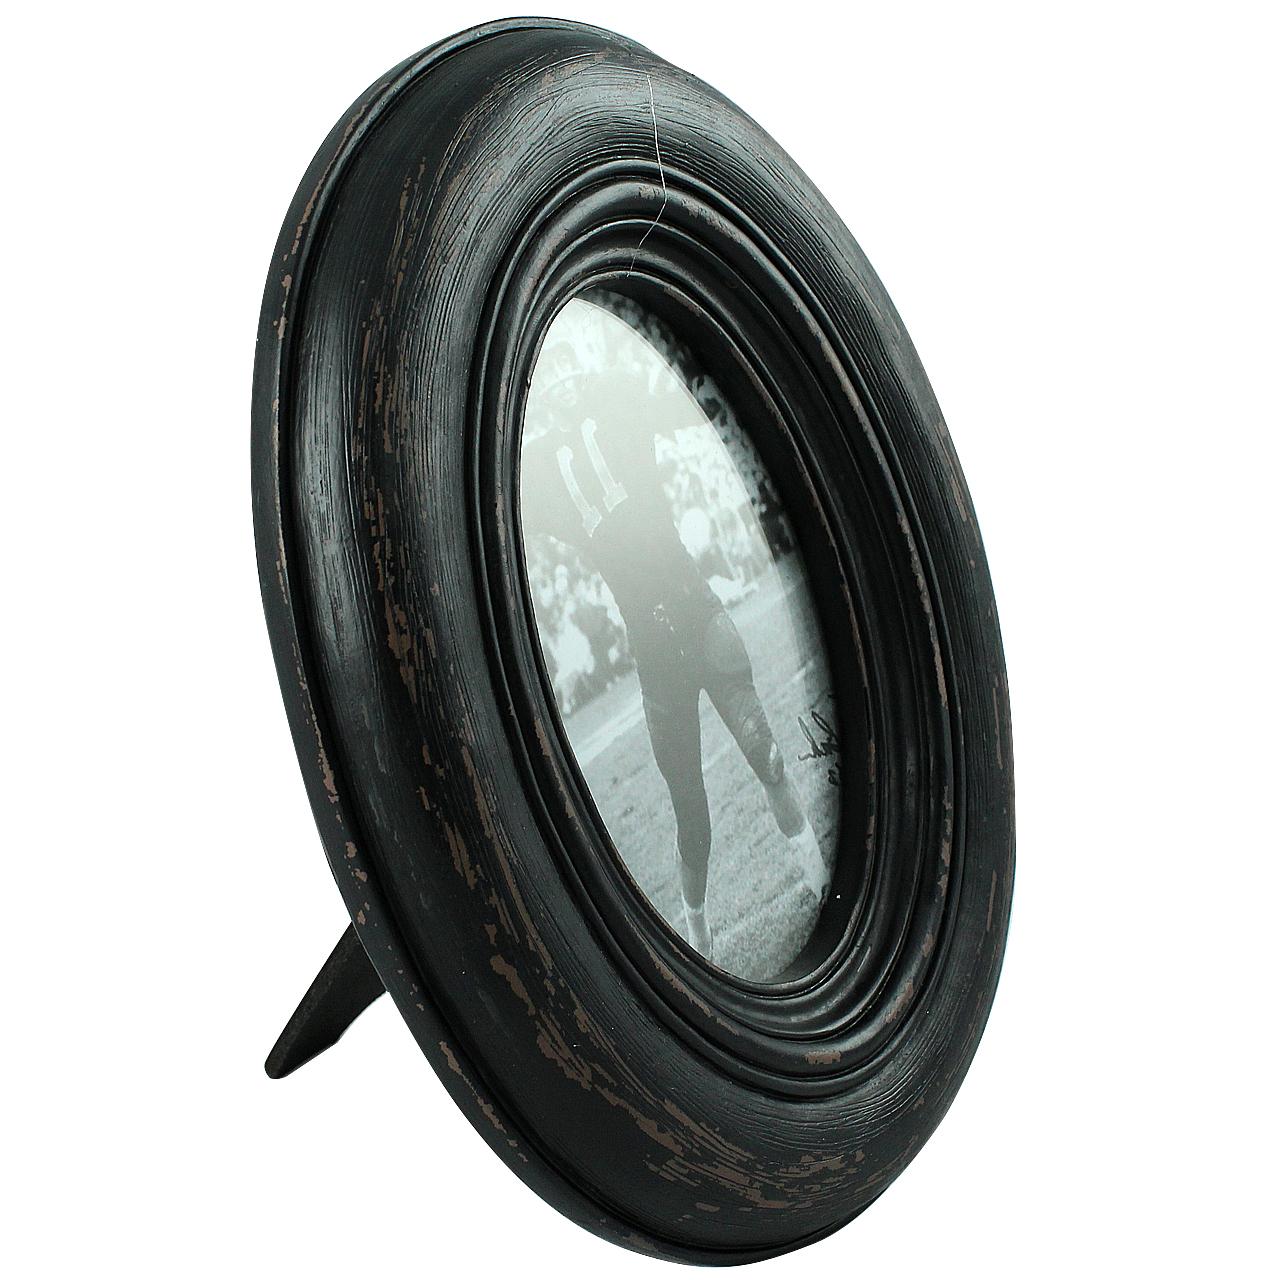 Rama Foto Ovala Din Lemn Negru 26x20 Cm